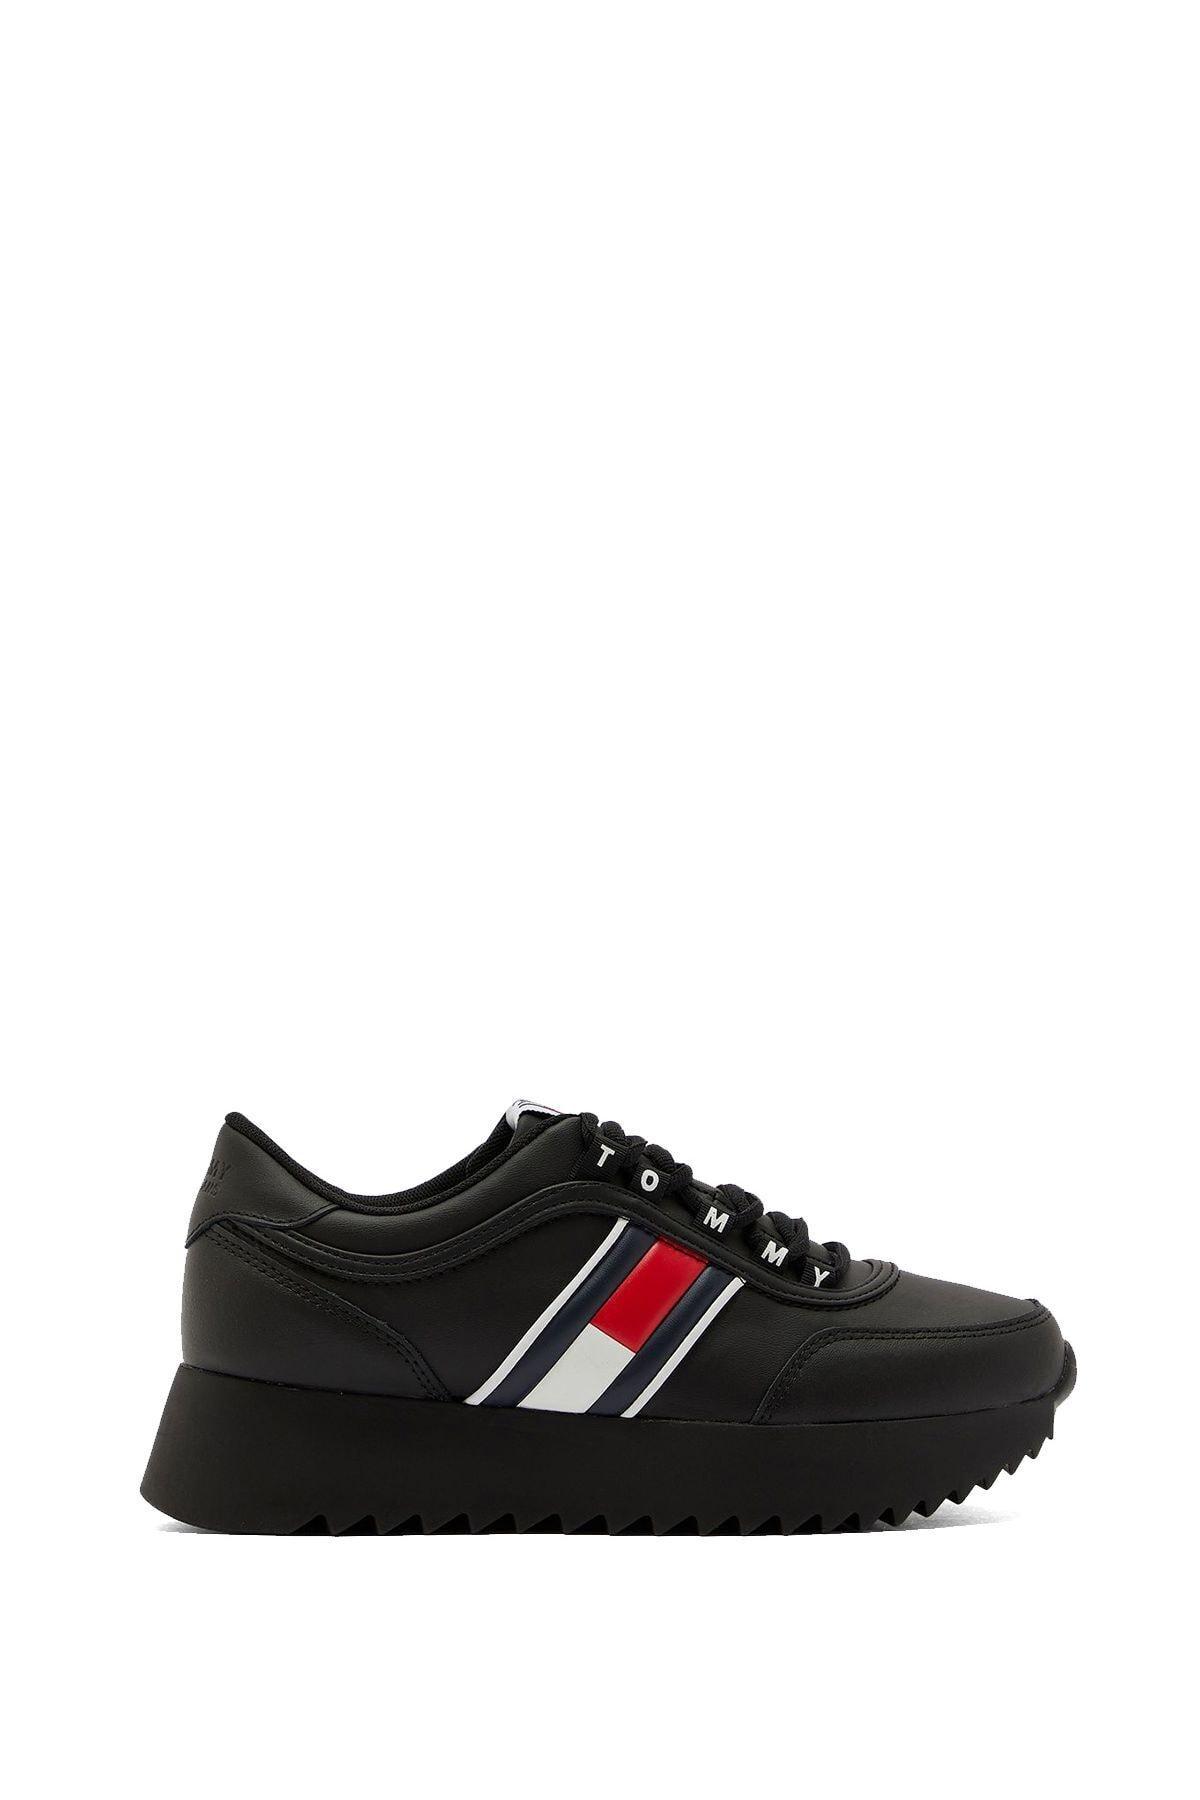 Tommy Hilfiger Kadın Siyah Sneaker 1